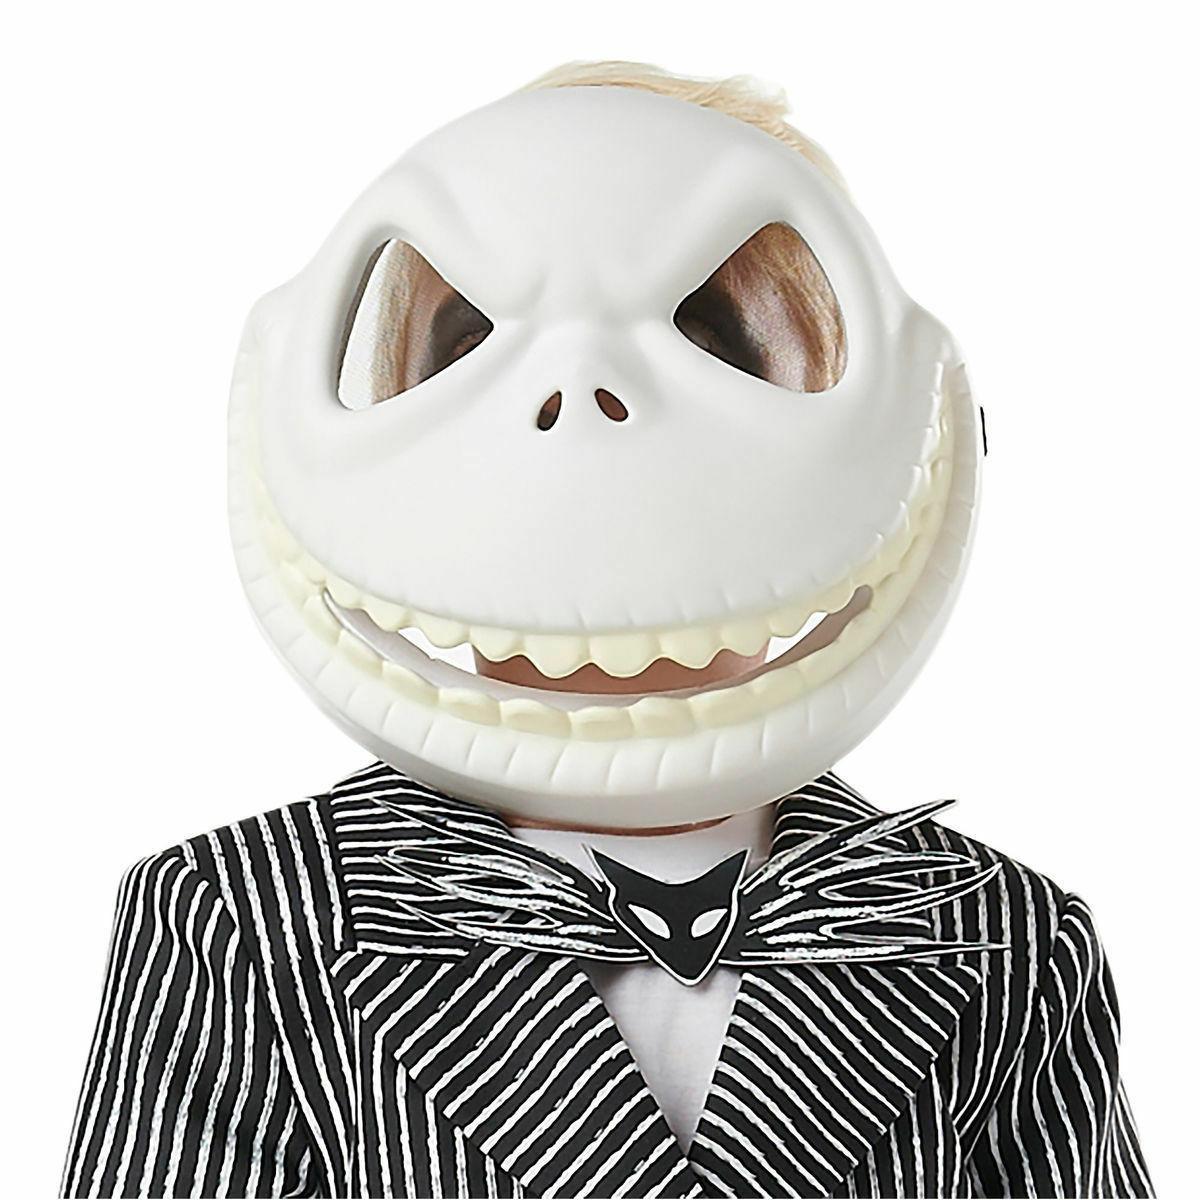 new Costume disney store 5/6